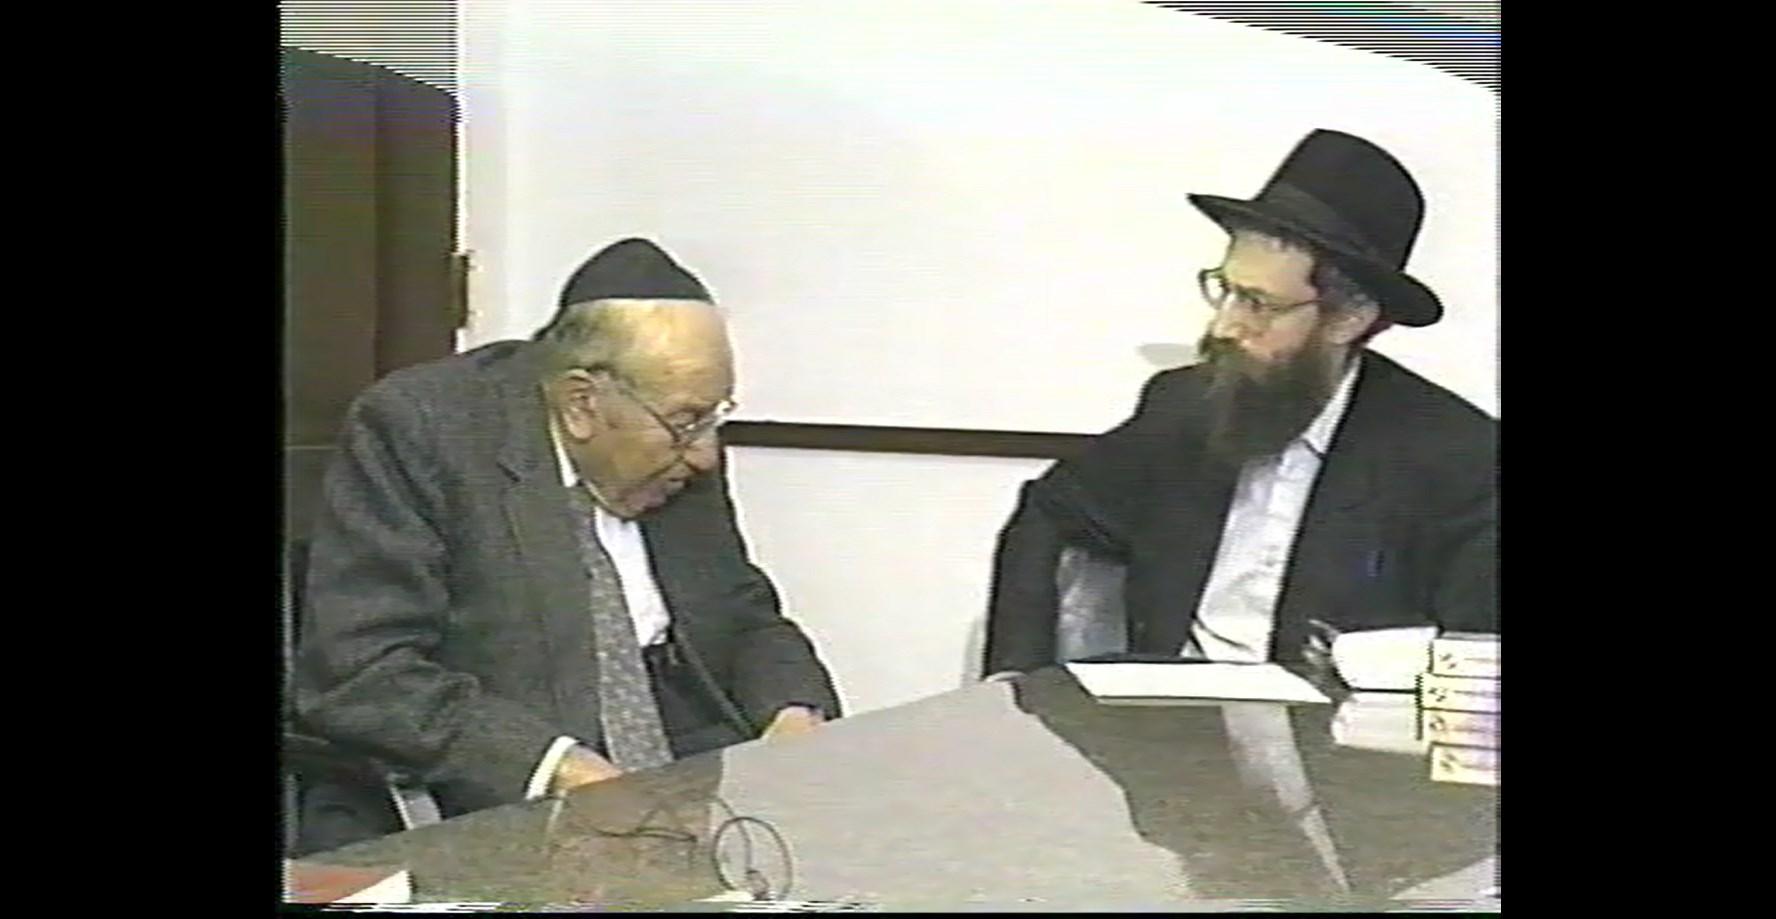 Prof. Radkowsky Interview with Prof. Silman.jpg